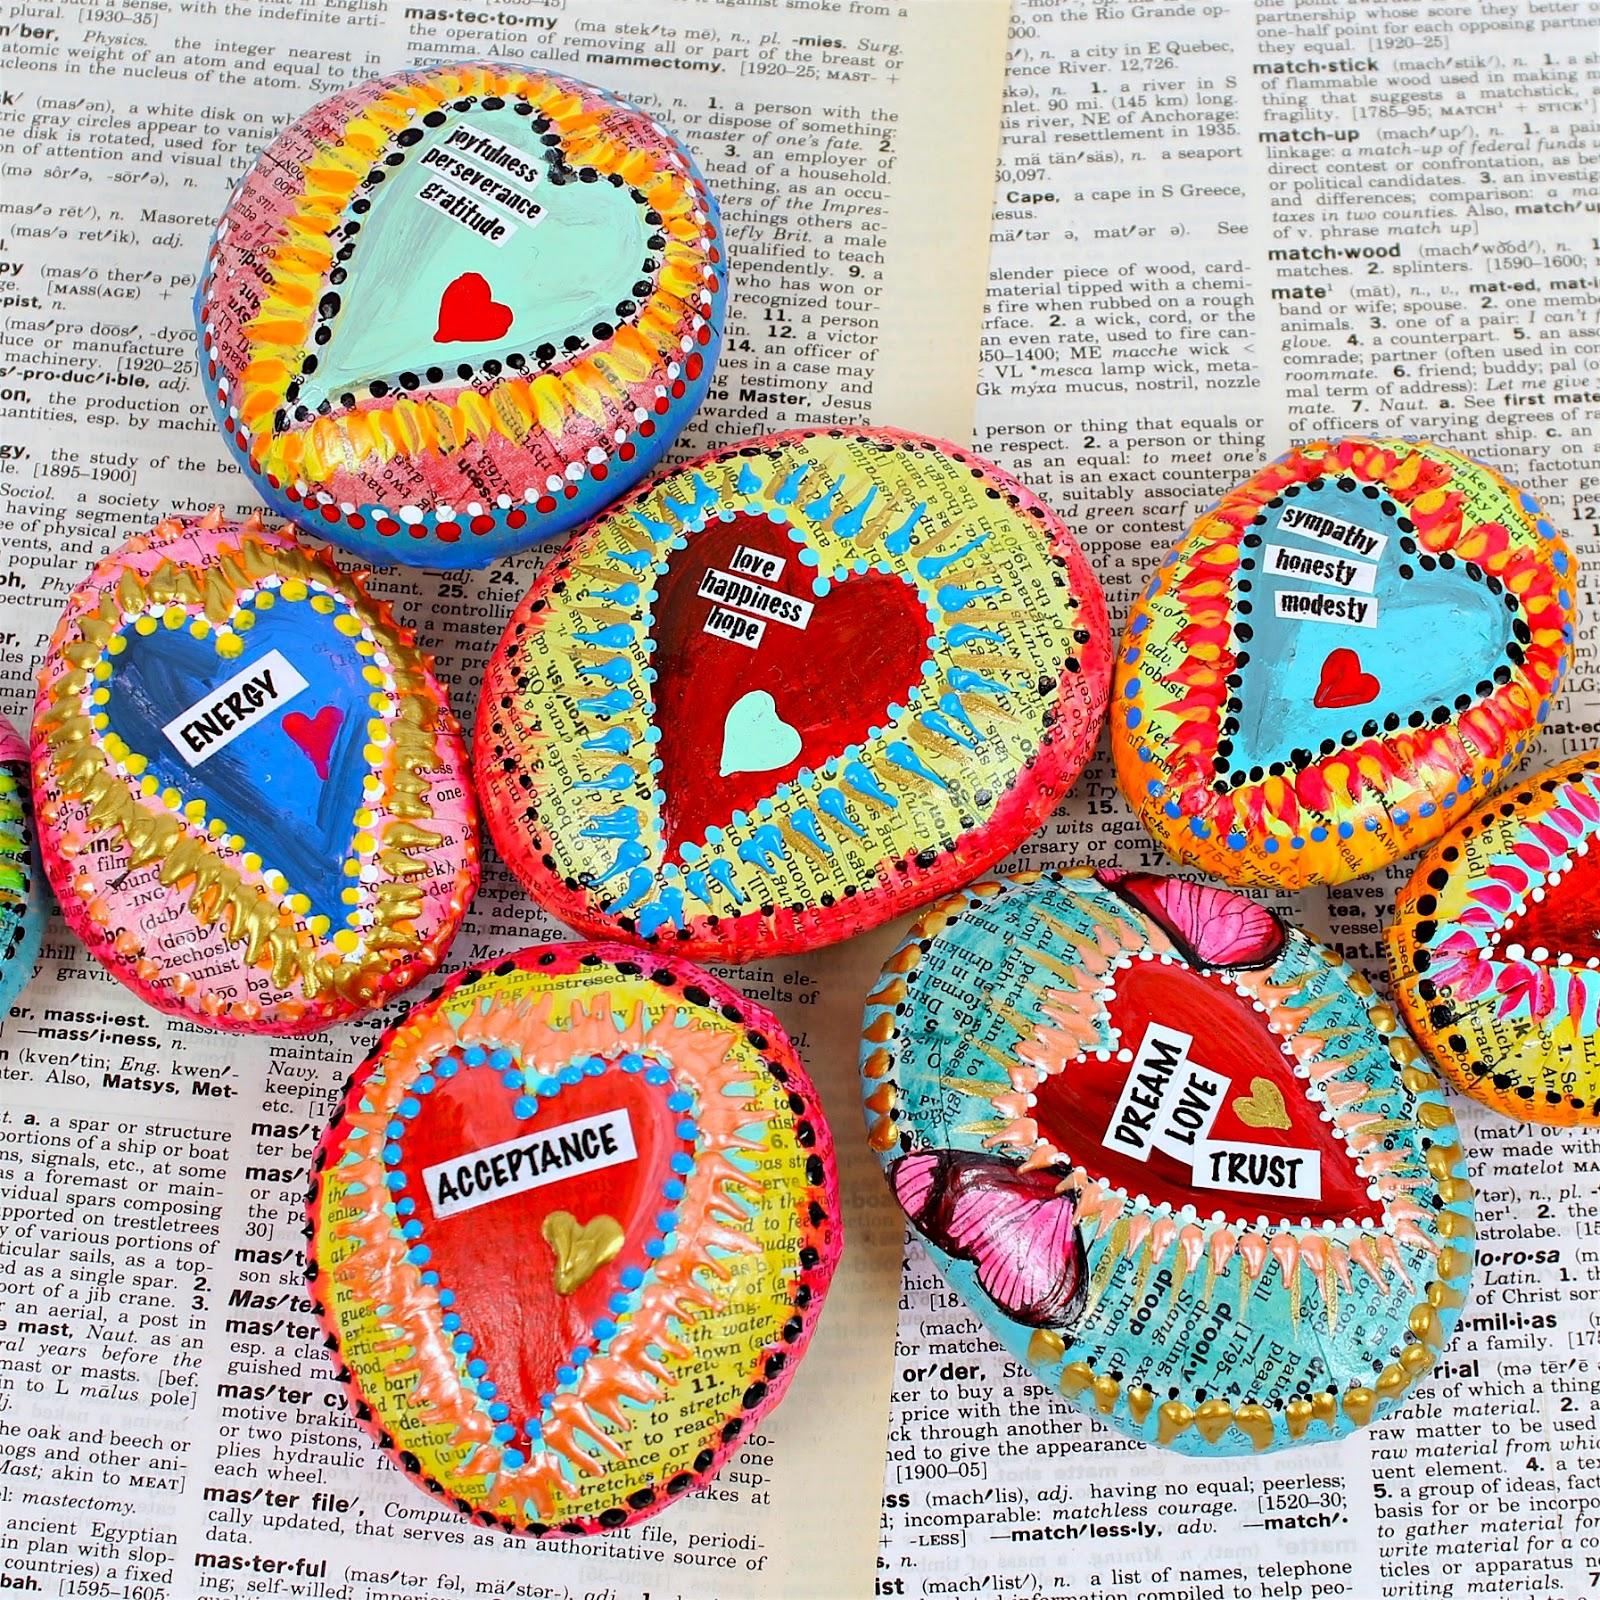 colorful DIY affirmation stones